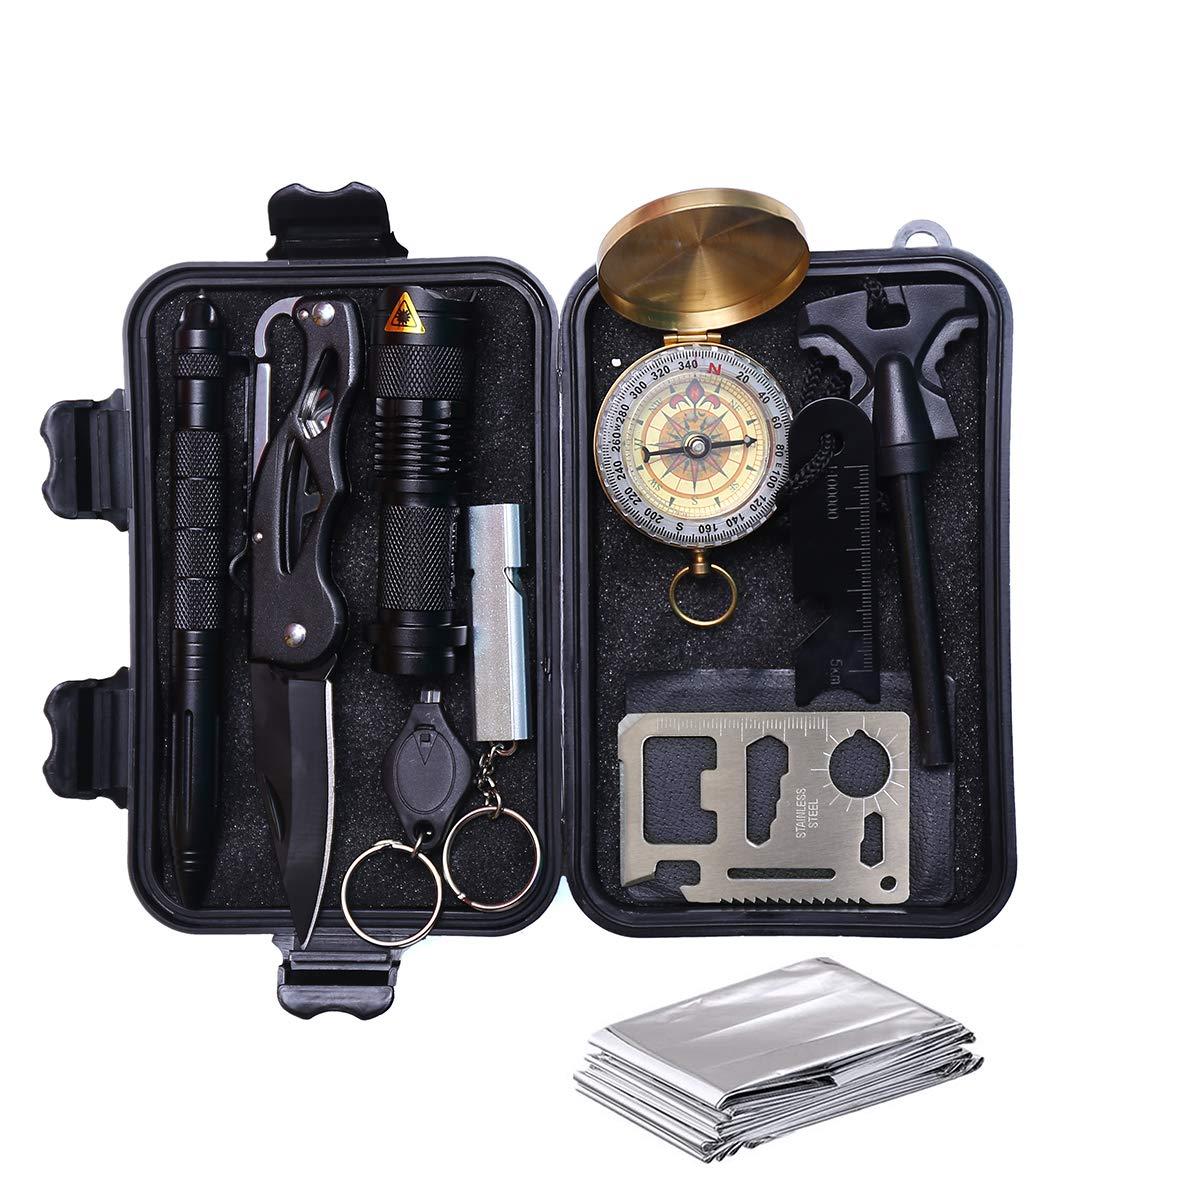 Anyeat Survival Kit, Außen Camping Survival Kit 9 in 1, Selbsthilfe Notfall Survival Kit Werkzeug NotÜBerlebens Camping Wandern Jagd Fahrzeug Werkzeuge Box Set